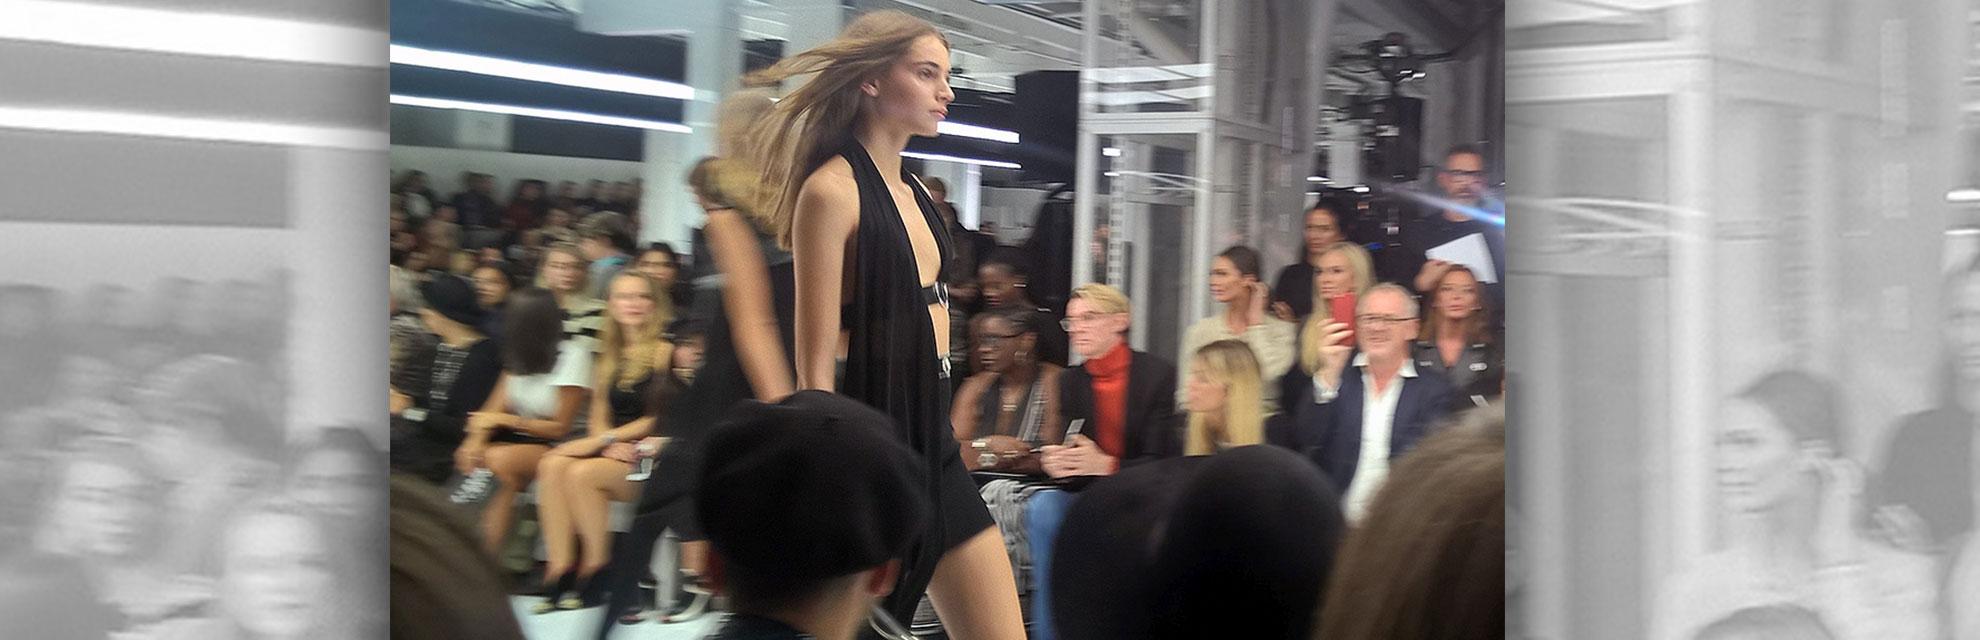 #VersusCalling: Versus Versace Storms London Fashion Week in True Style